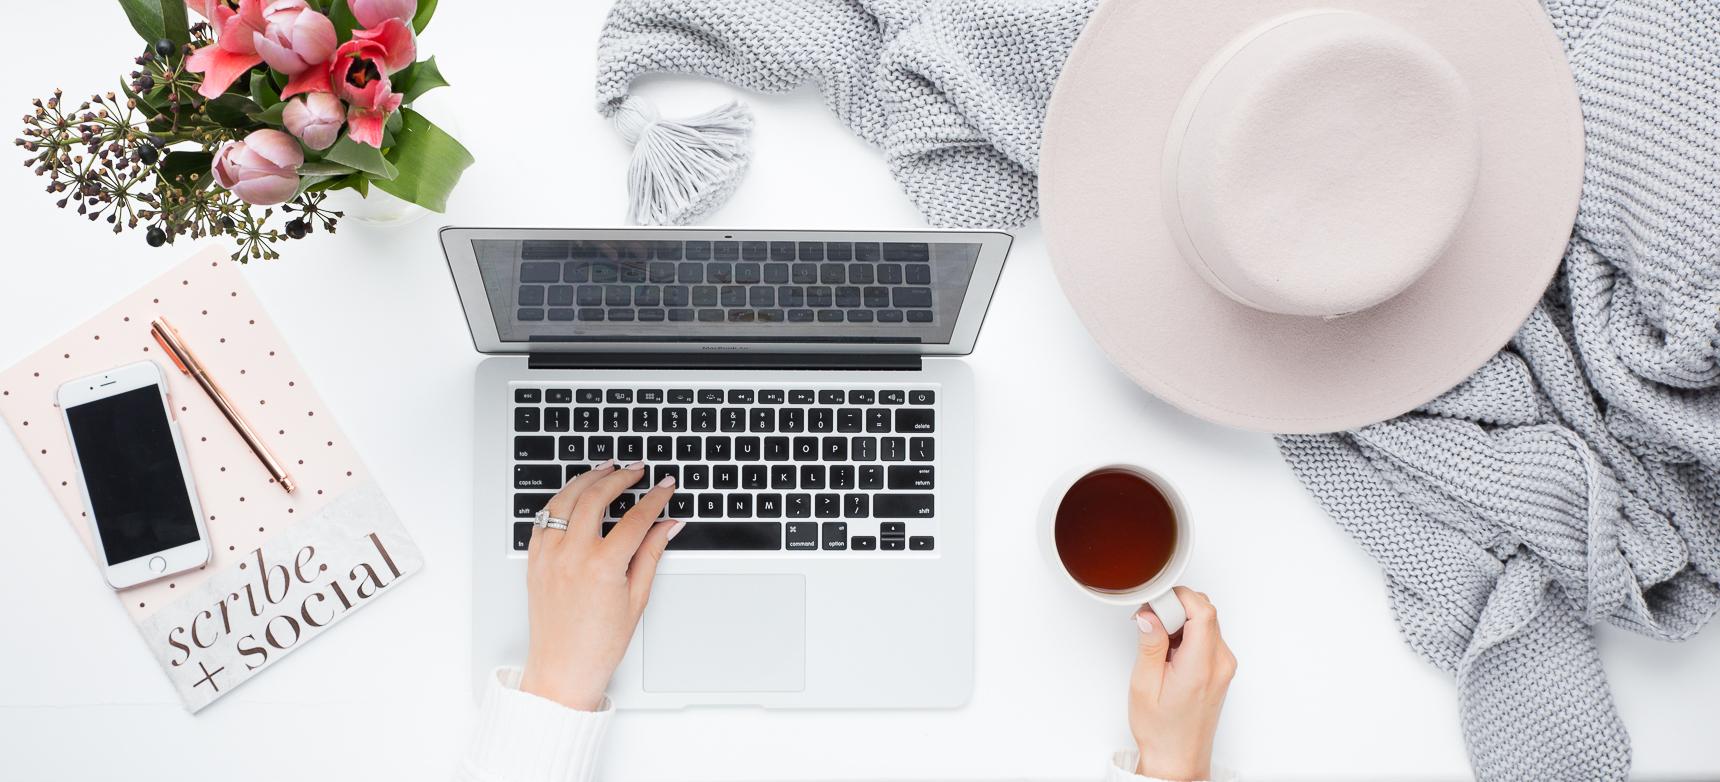 scribe-and-social-website-9.jpg